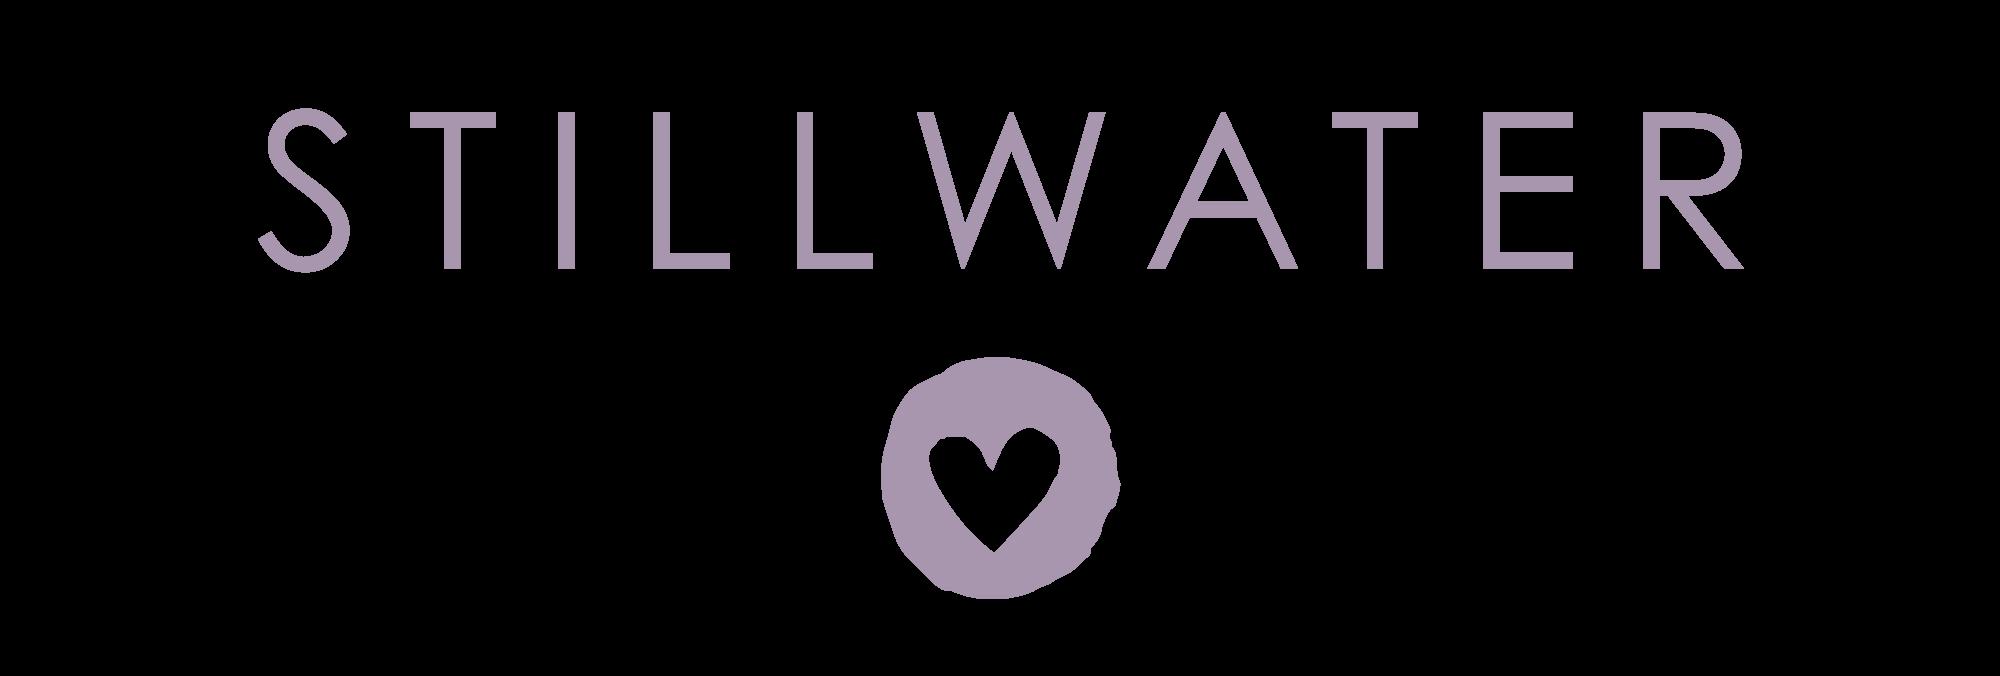 stillwater_logo-ICON.png